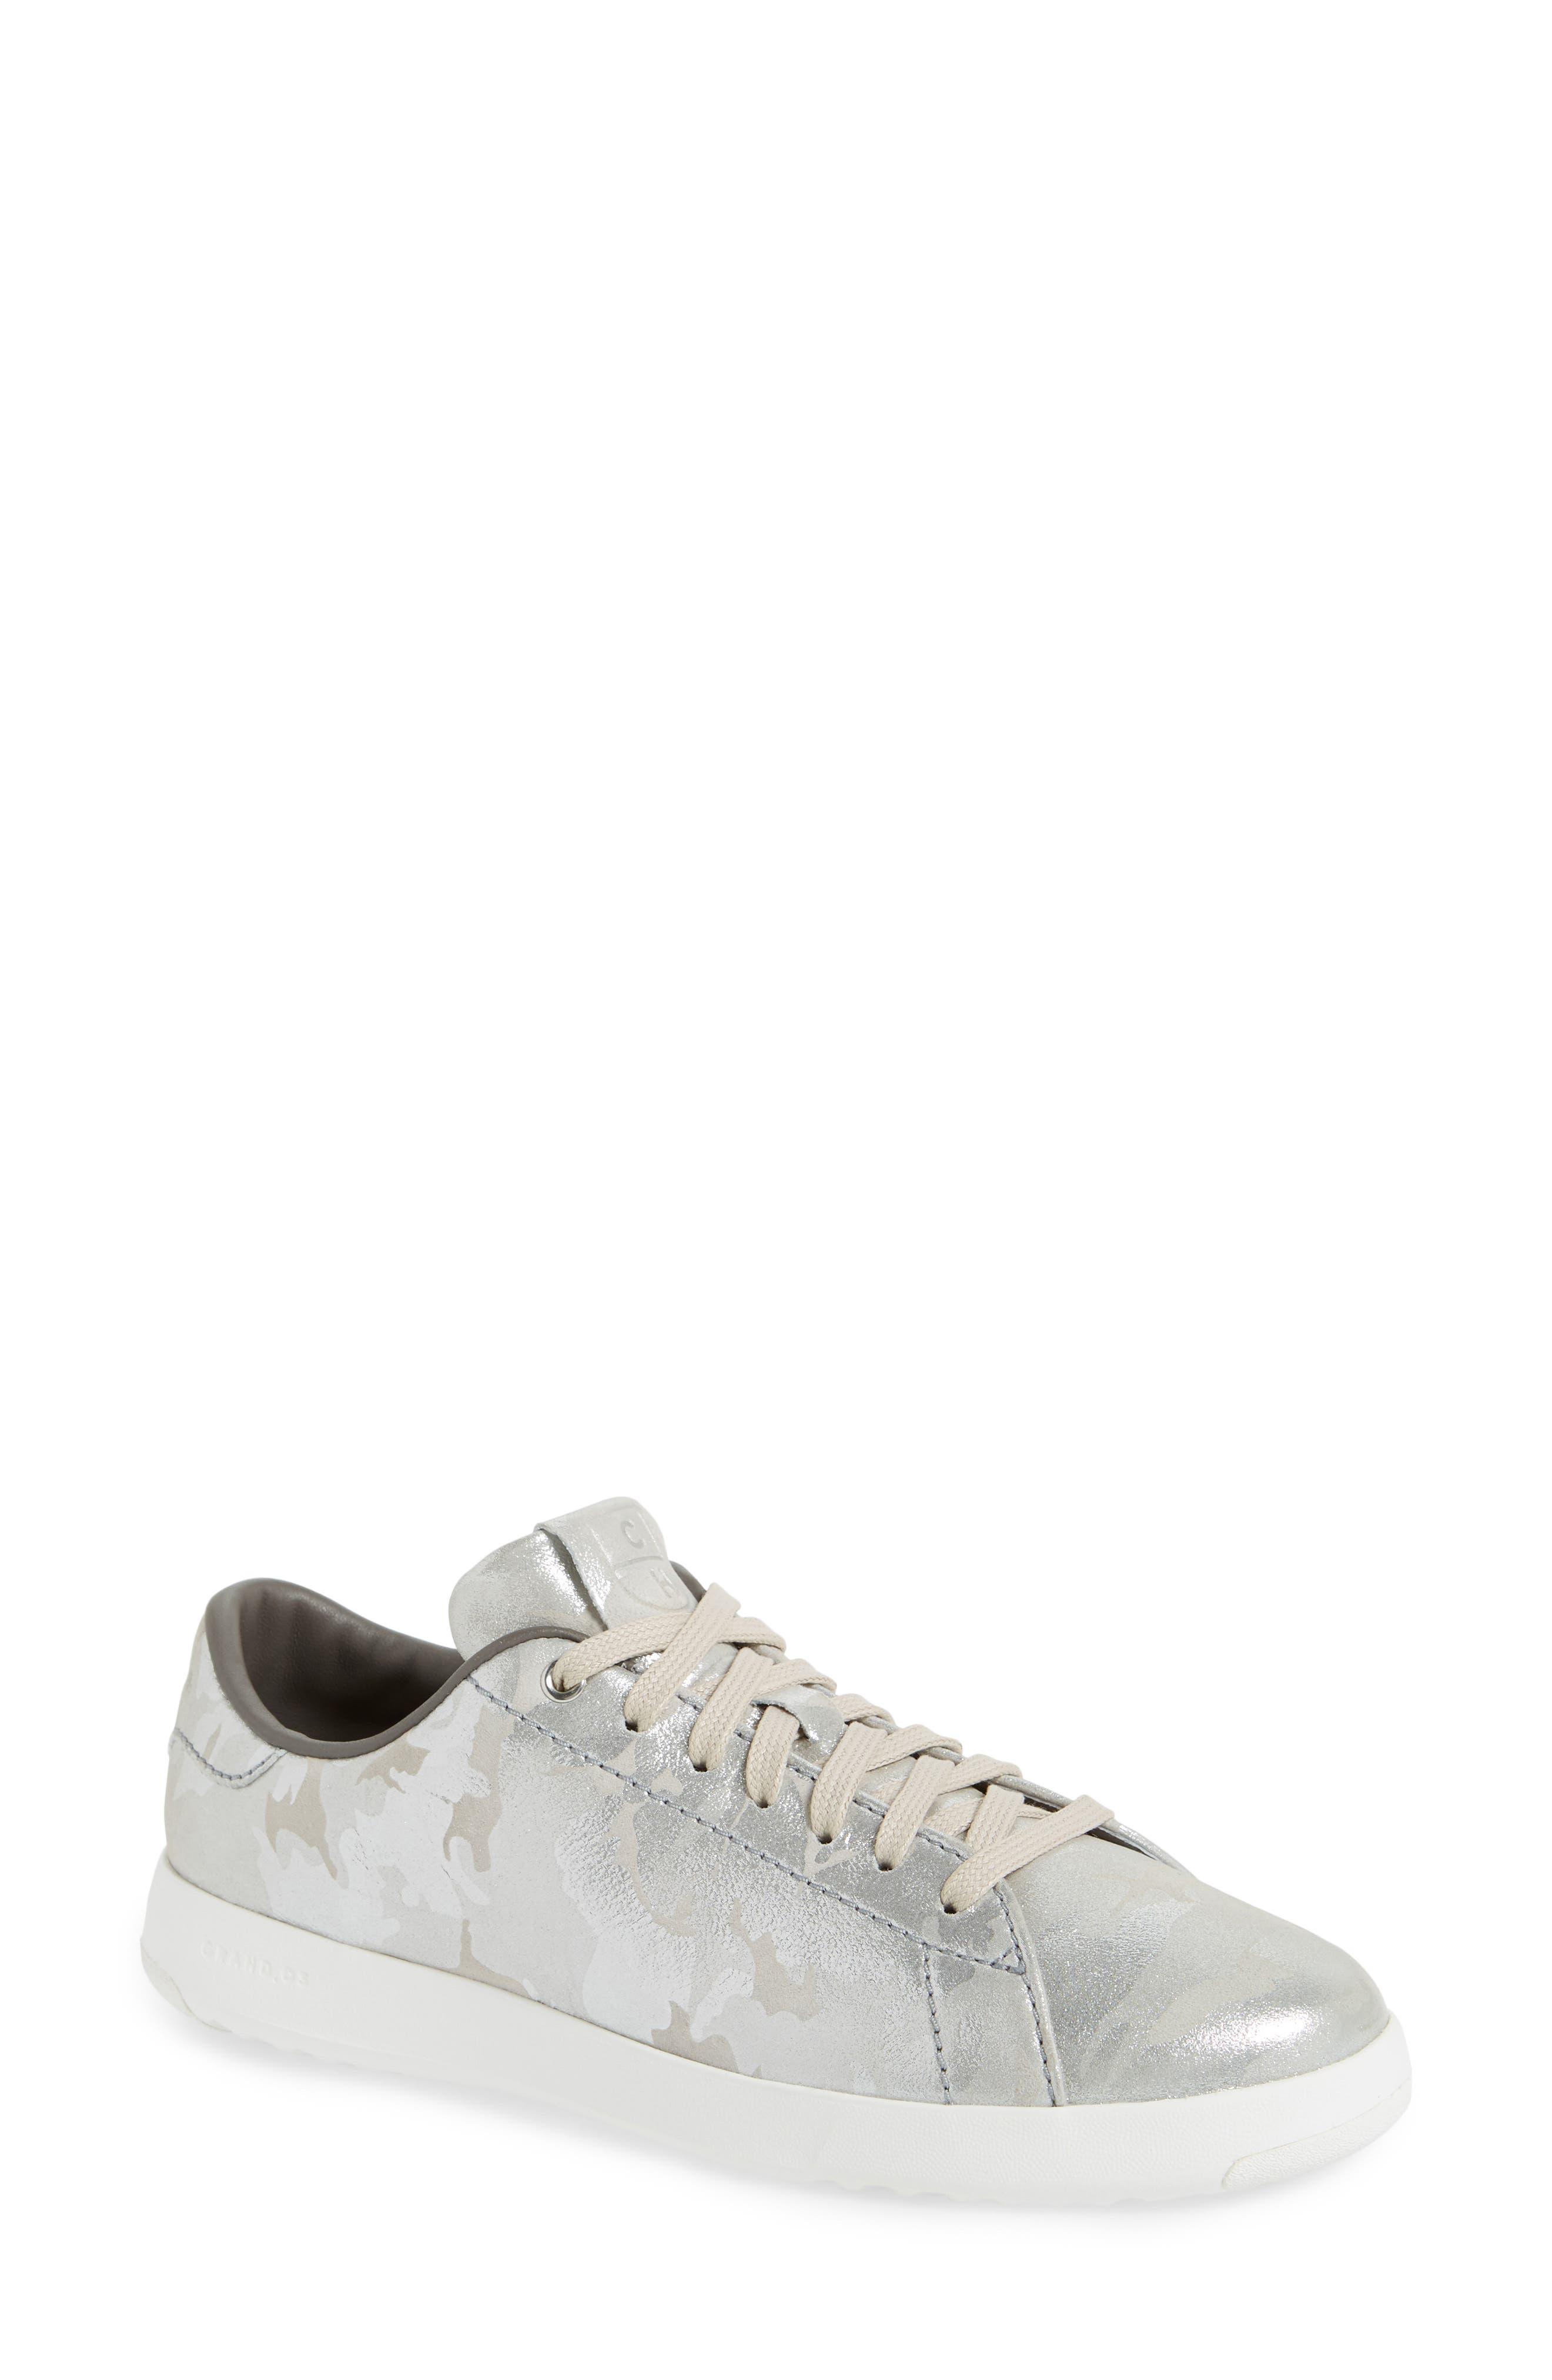 GrandPro Tennis Shoe,                         Main,                         color, Dove Metallic Camo Leather